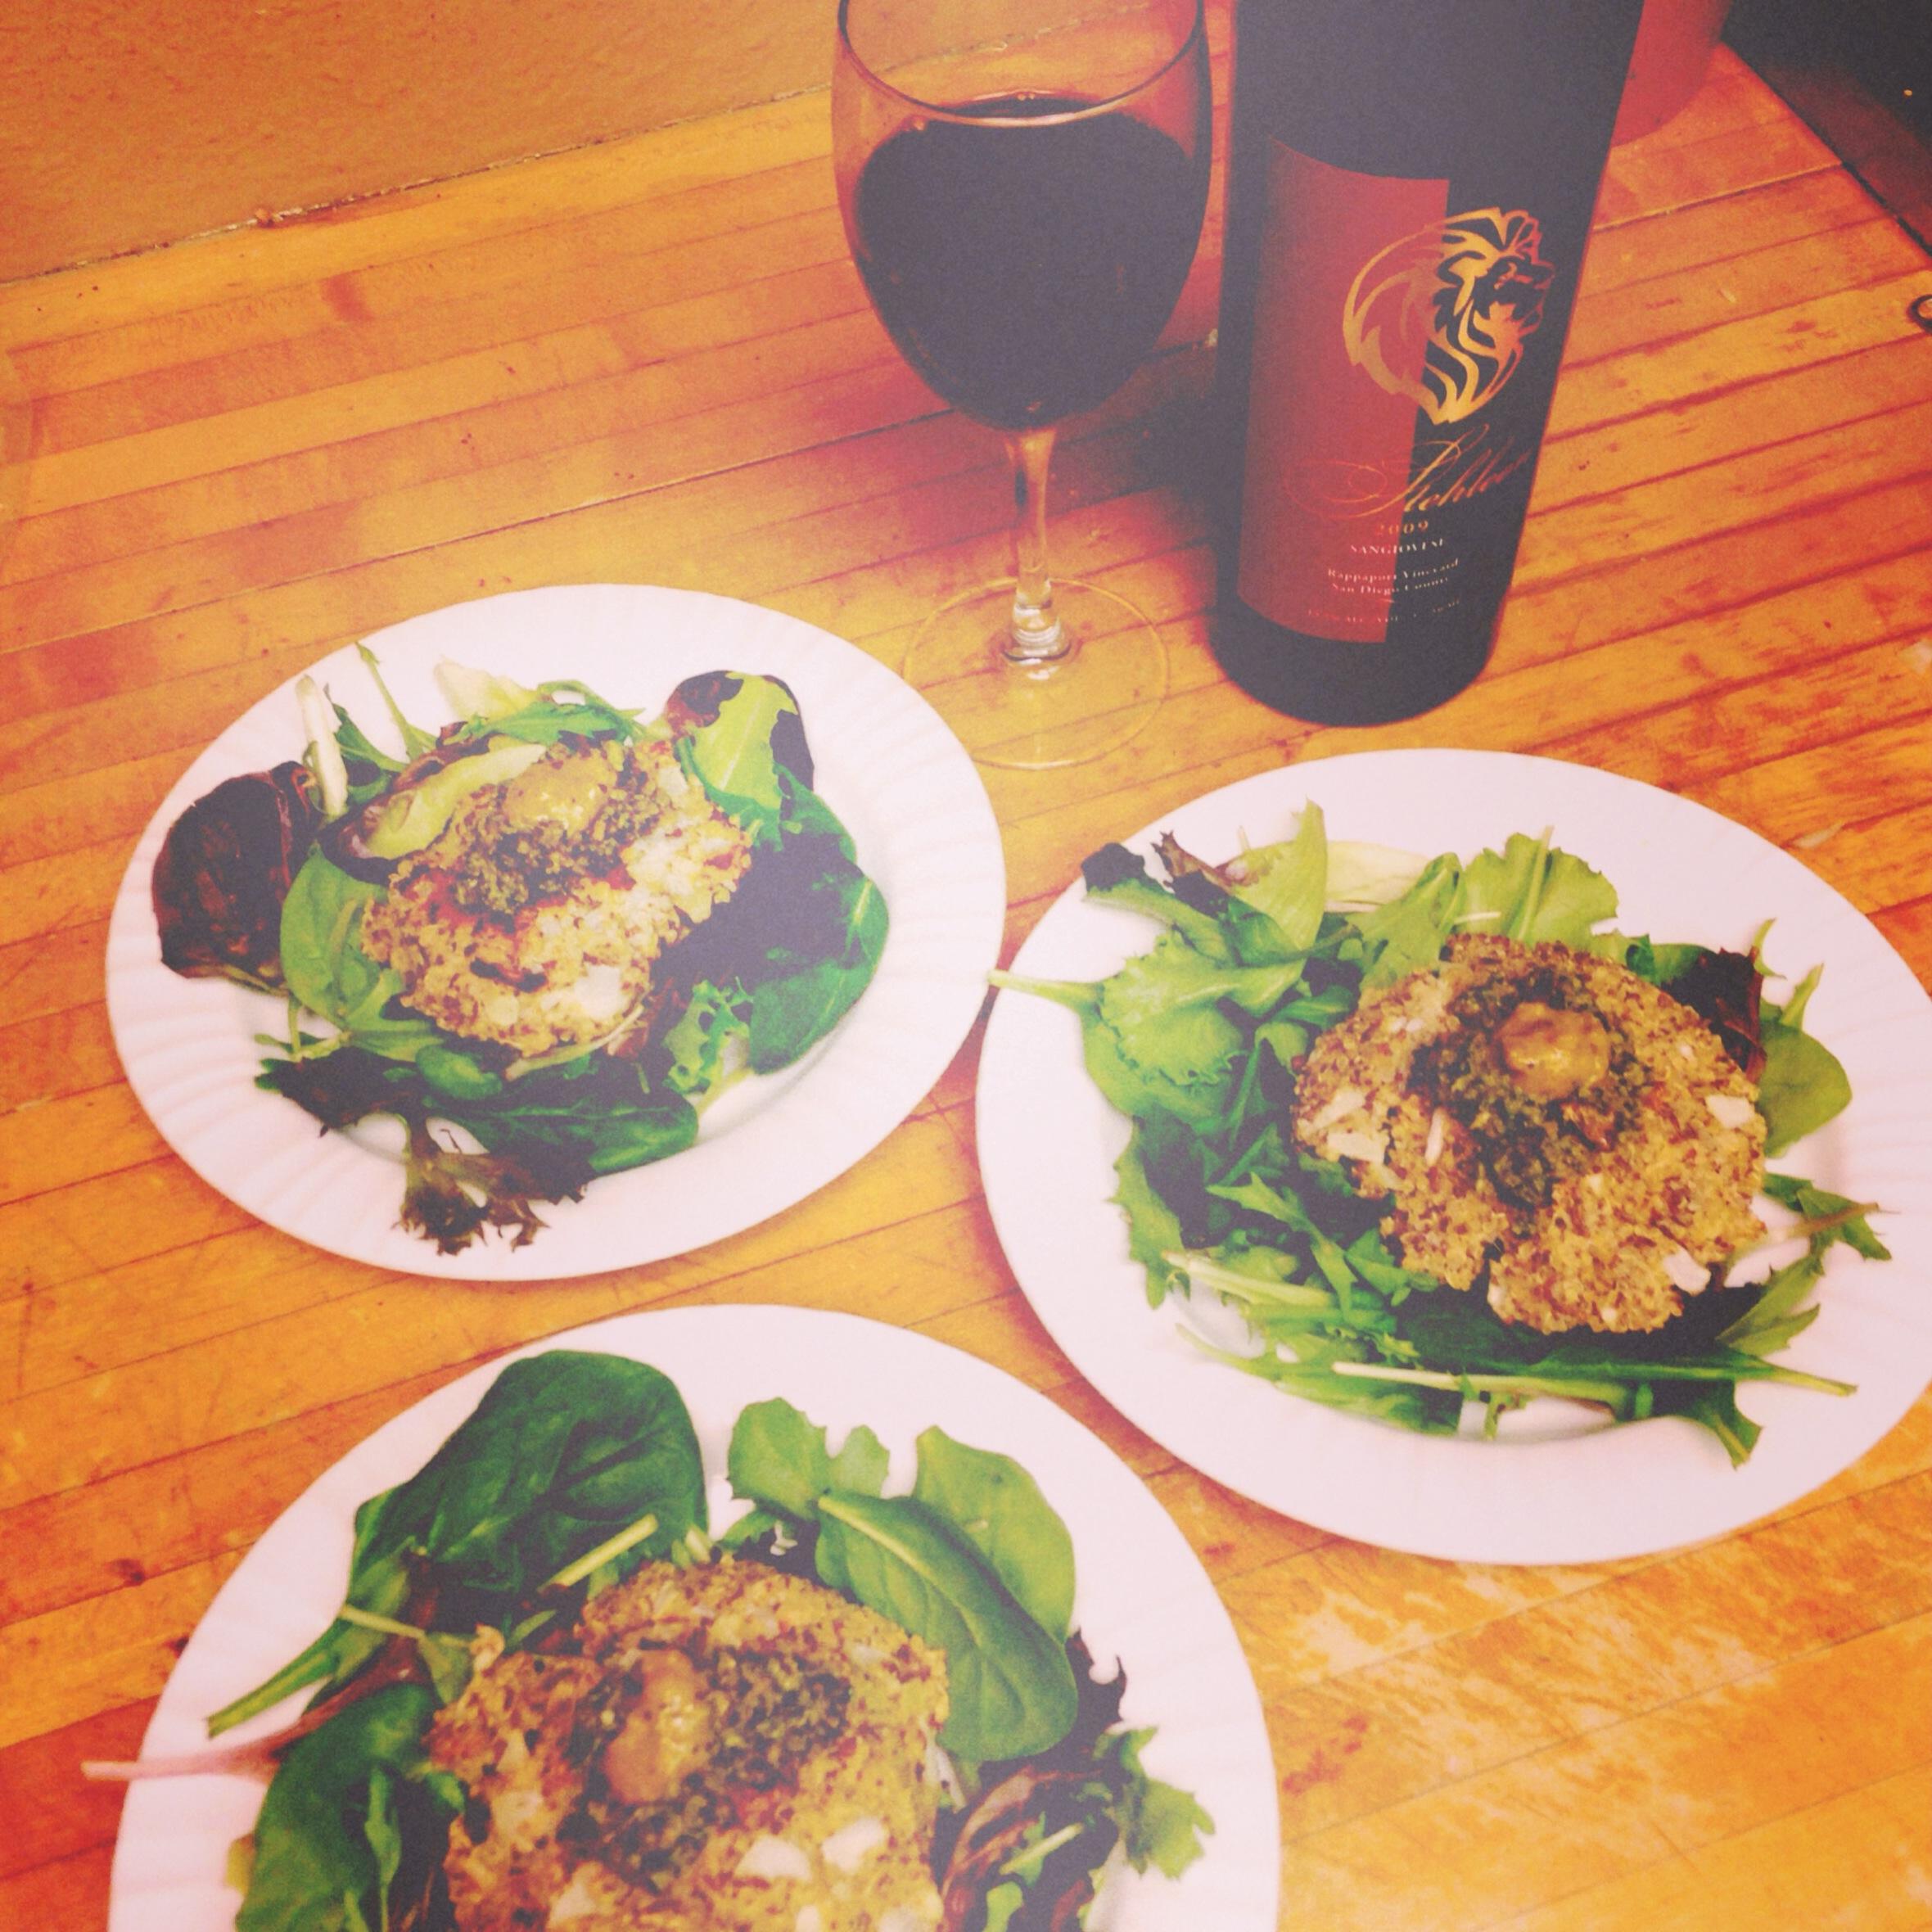 Quinoa cakes w/ basil pesto | Wellness + Wanderlust